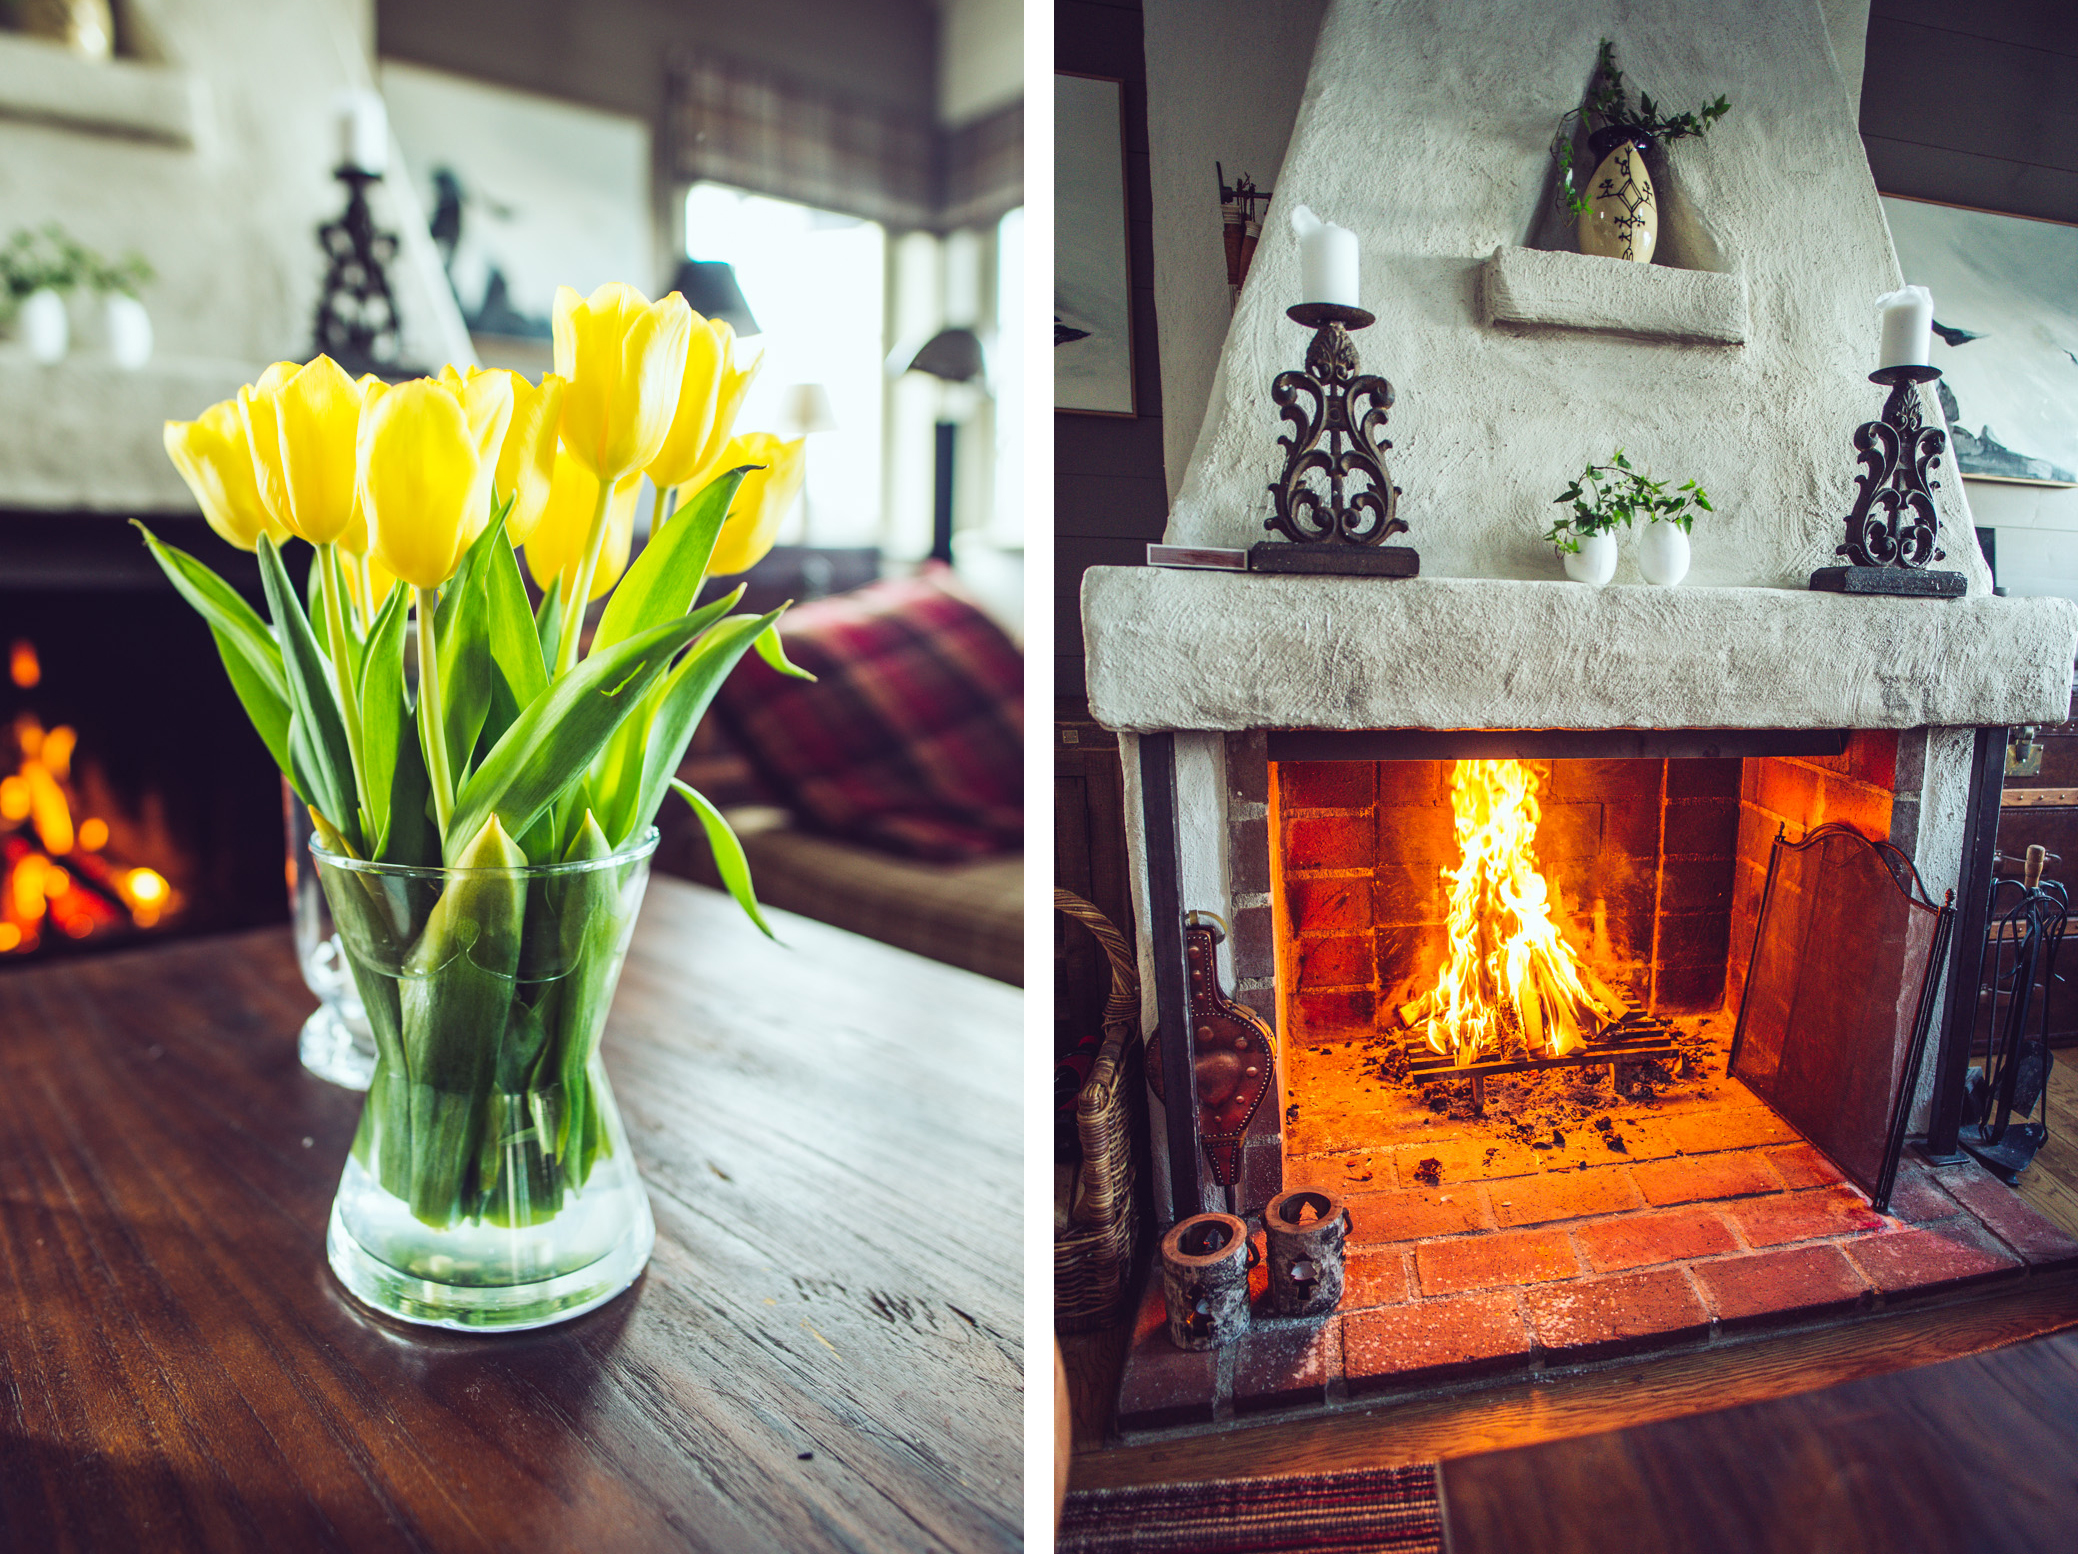 janni-deler-fireplace-morning-areDSC_5241